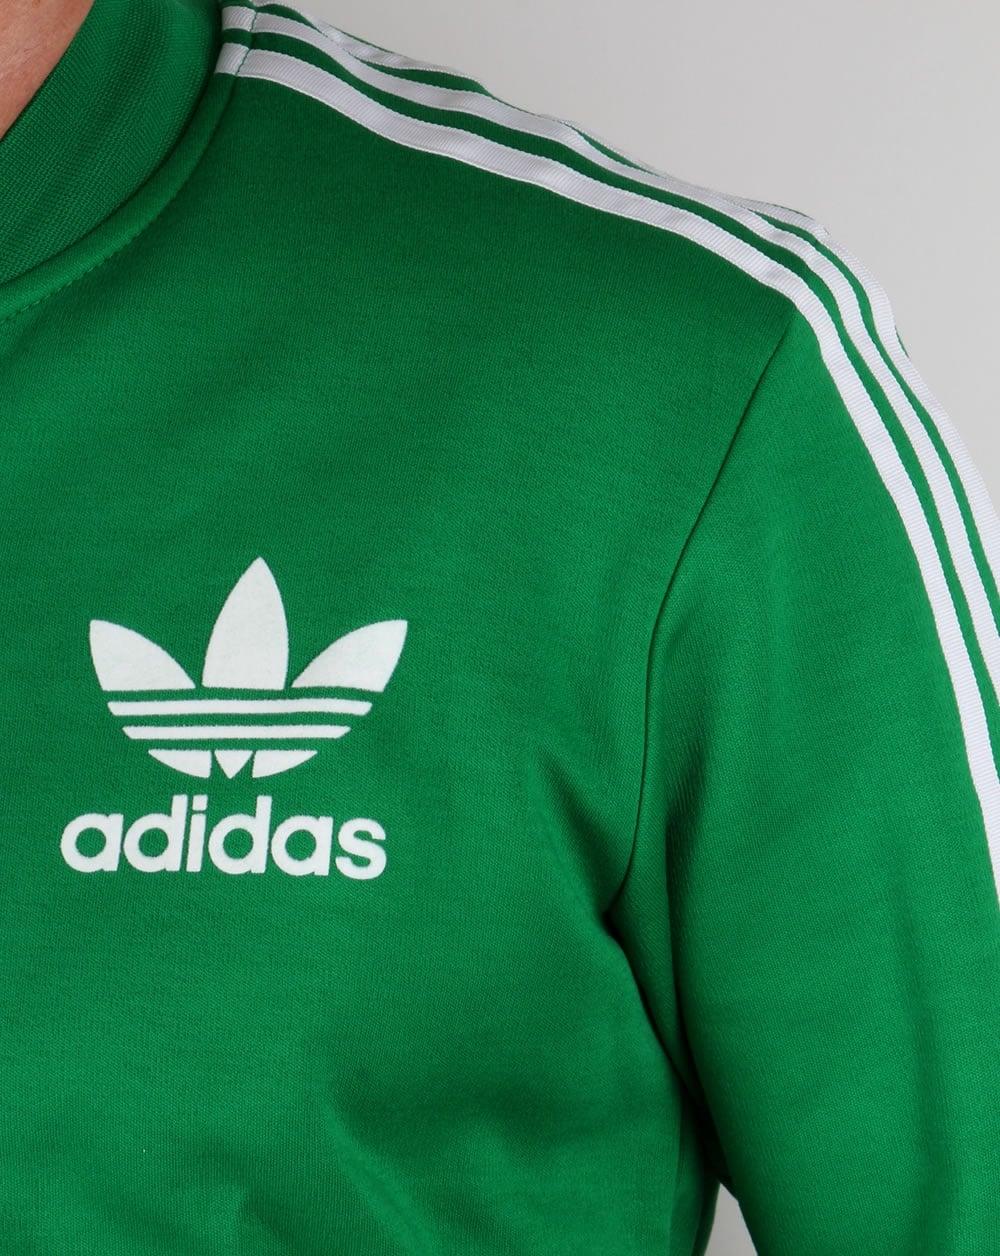 Adidas Originaler Super Jakke Grønn qea7lNKgl